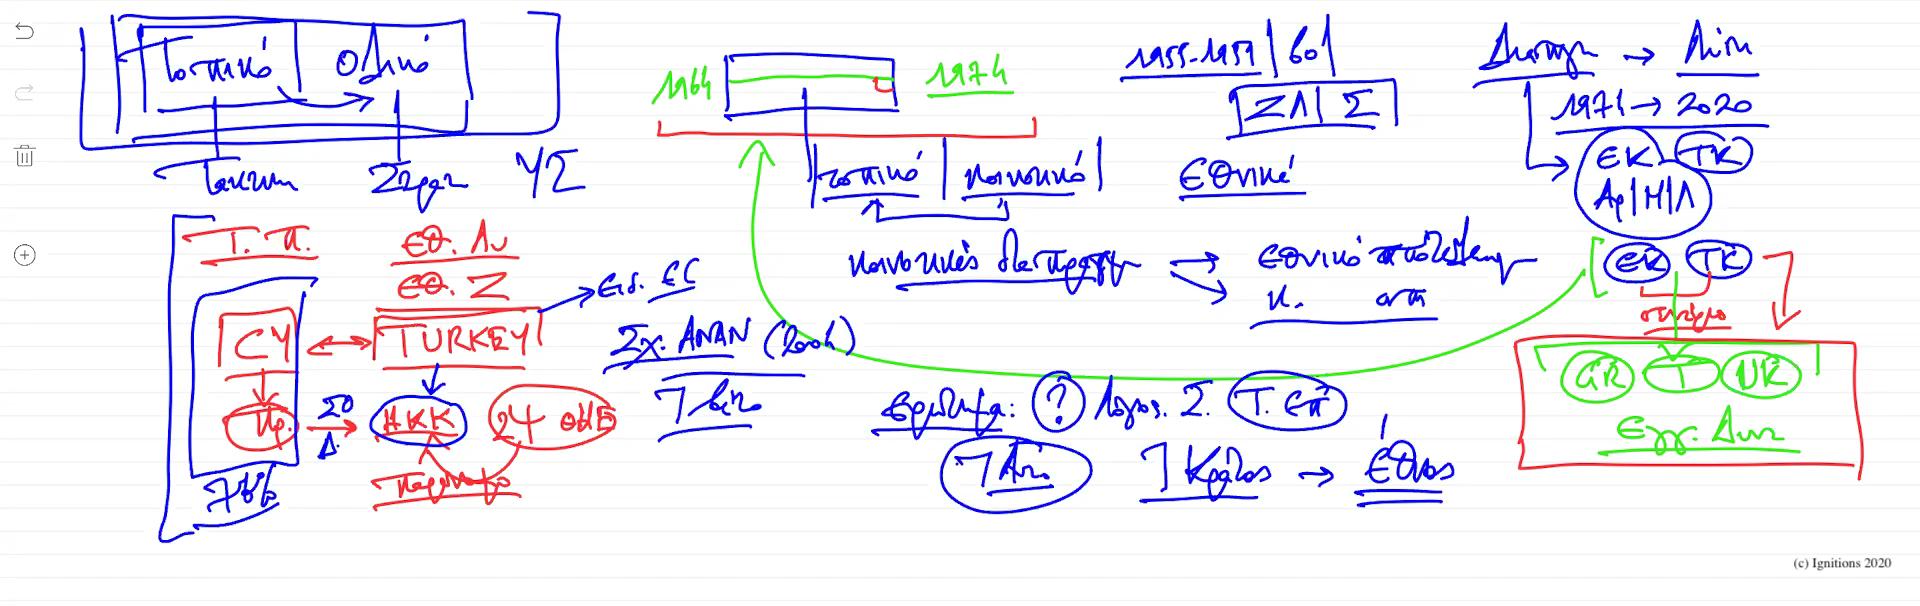 56462 - VII - e-Διάλεξη: Ελληνική Γεωστρατηγική II. (Dessin)